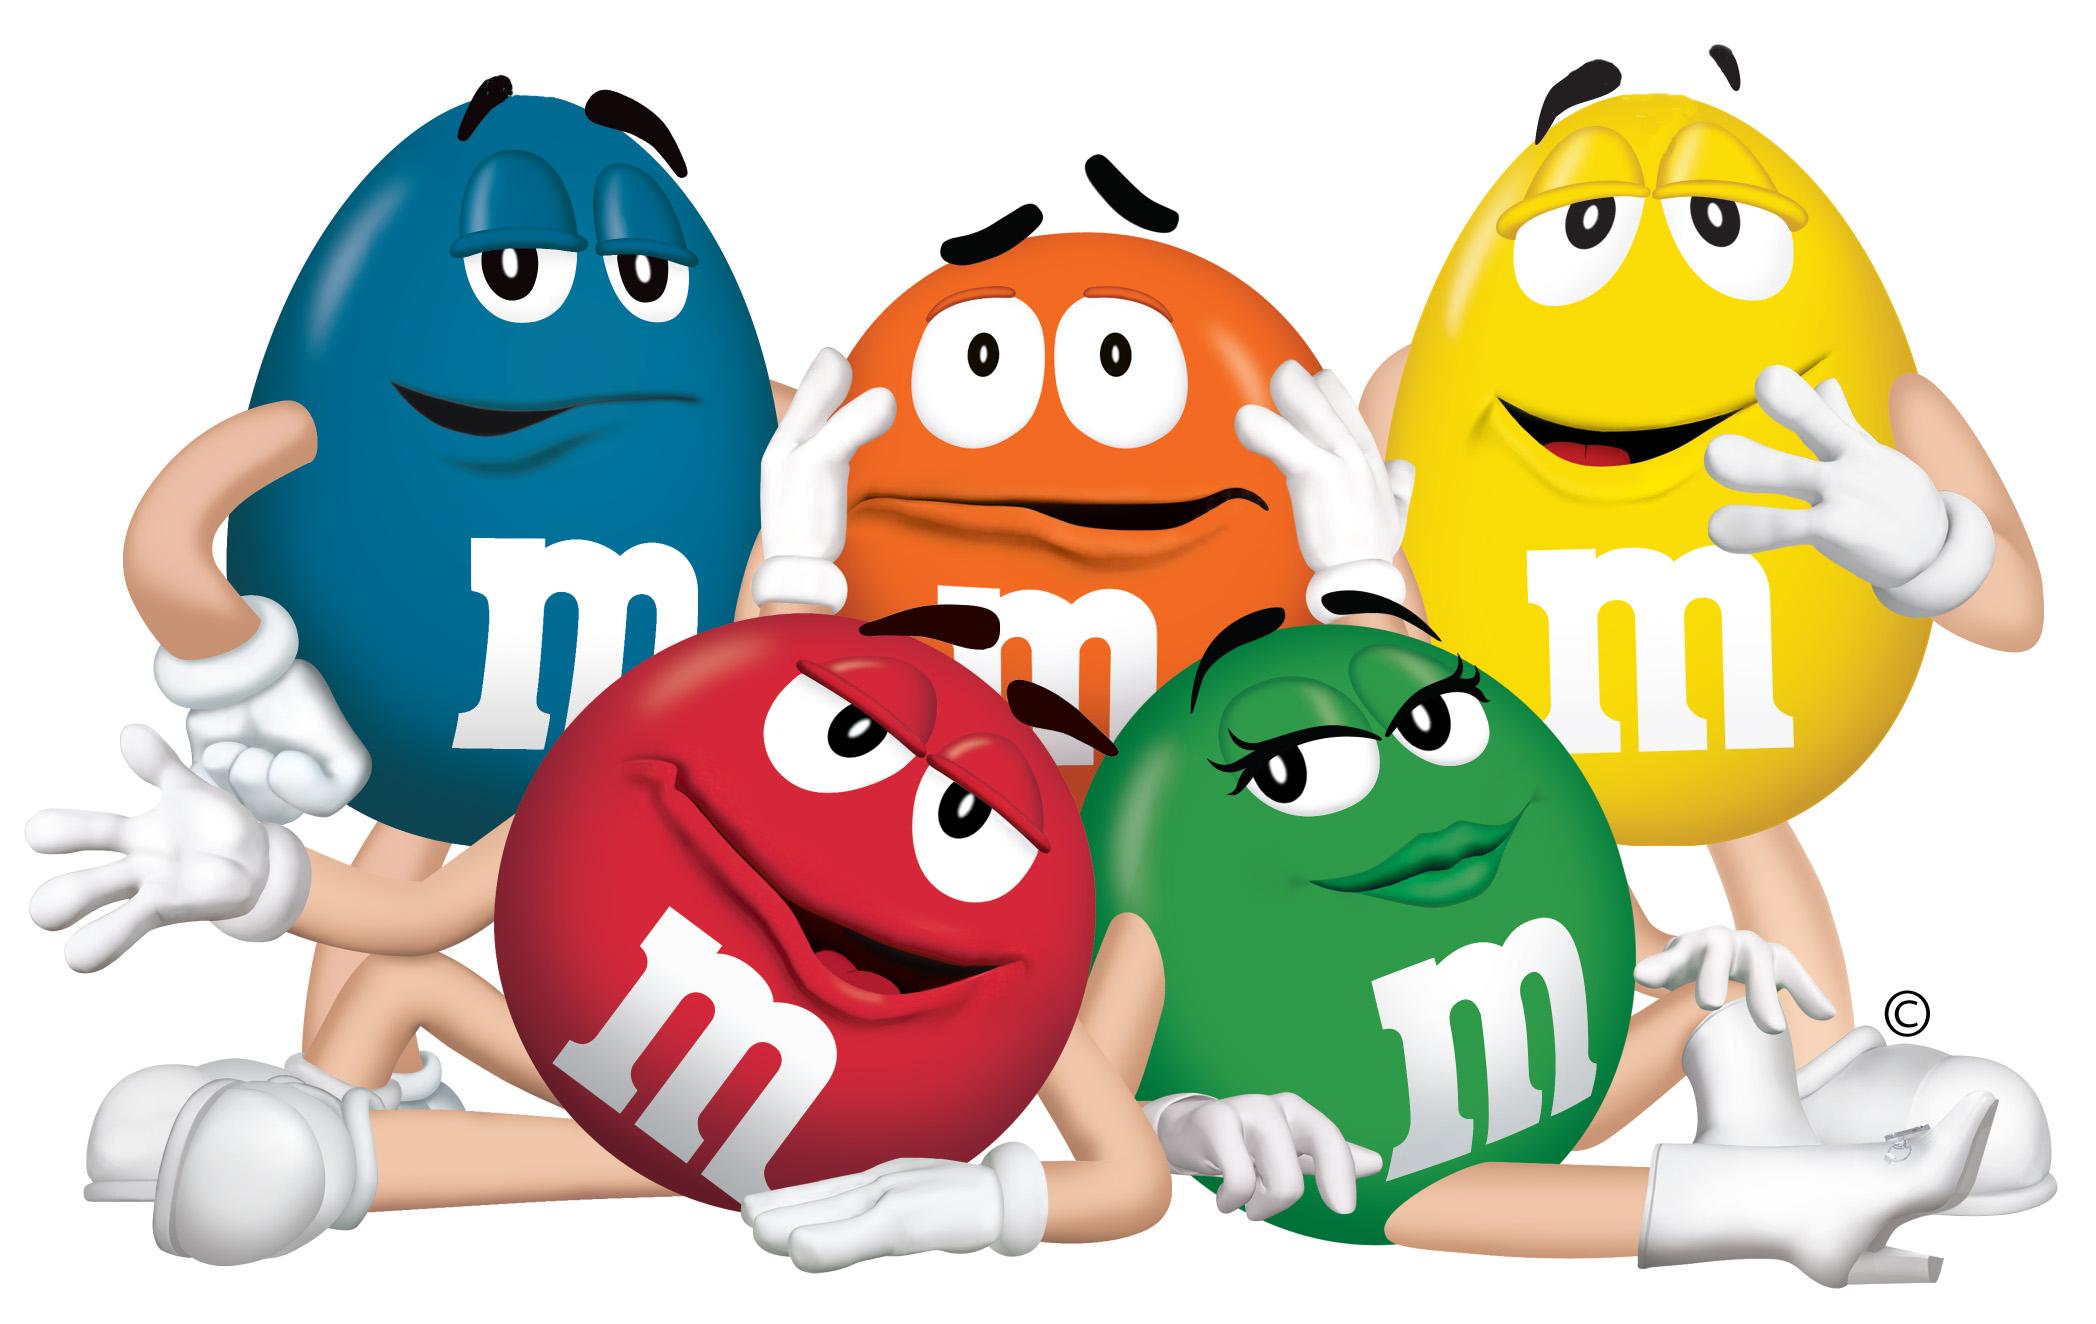 Mu0026amp;m Candy Clipart-Mu0026amp;m Candy Clipart-3